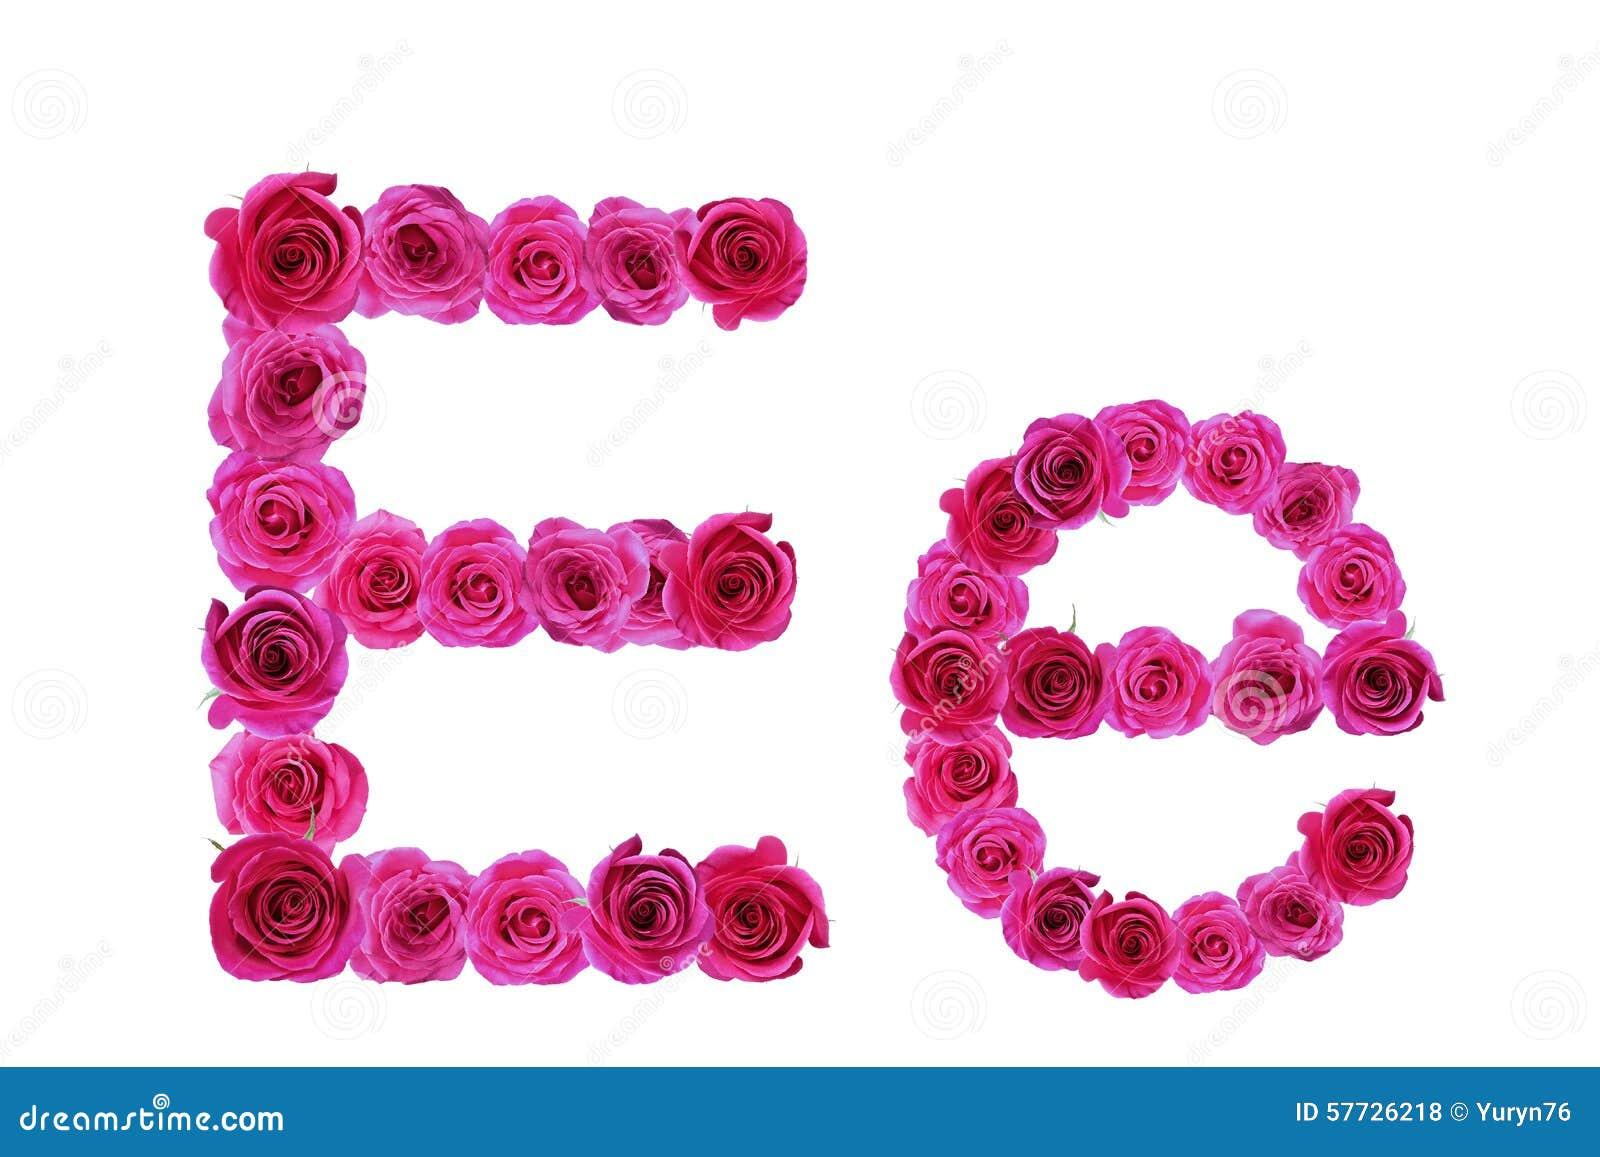 Letter E Of Roses Stock Photo - Image: 57726218